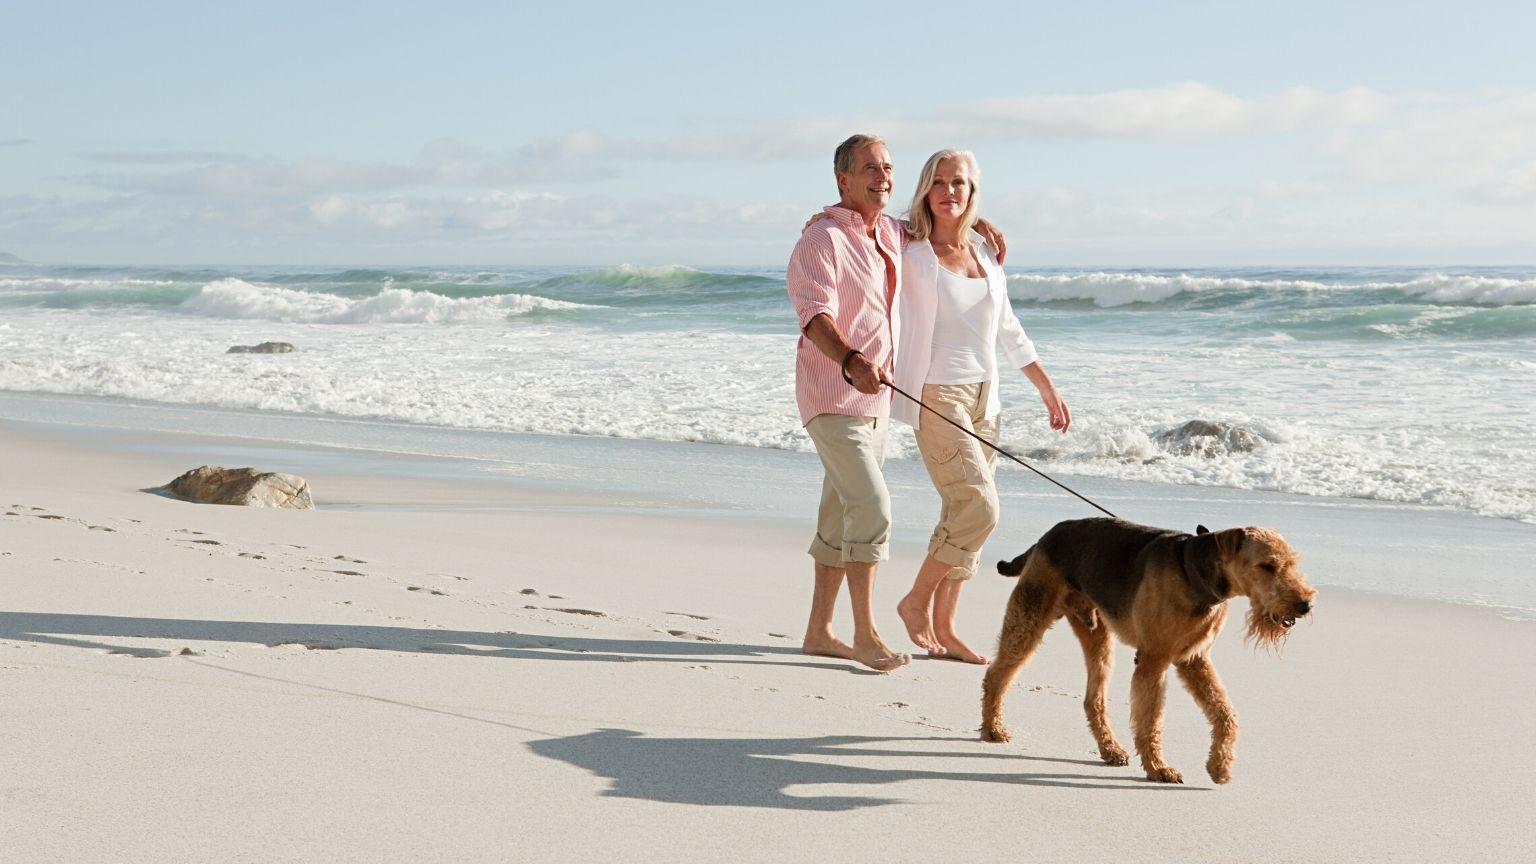 Couple walking dog on beach